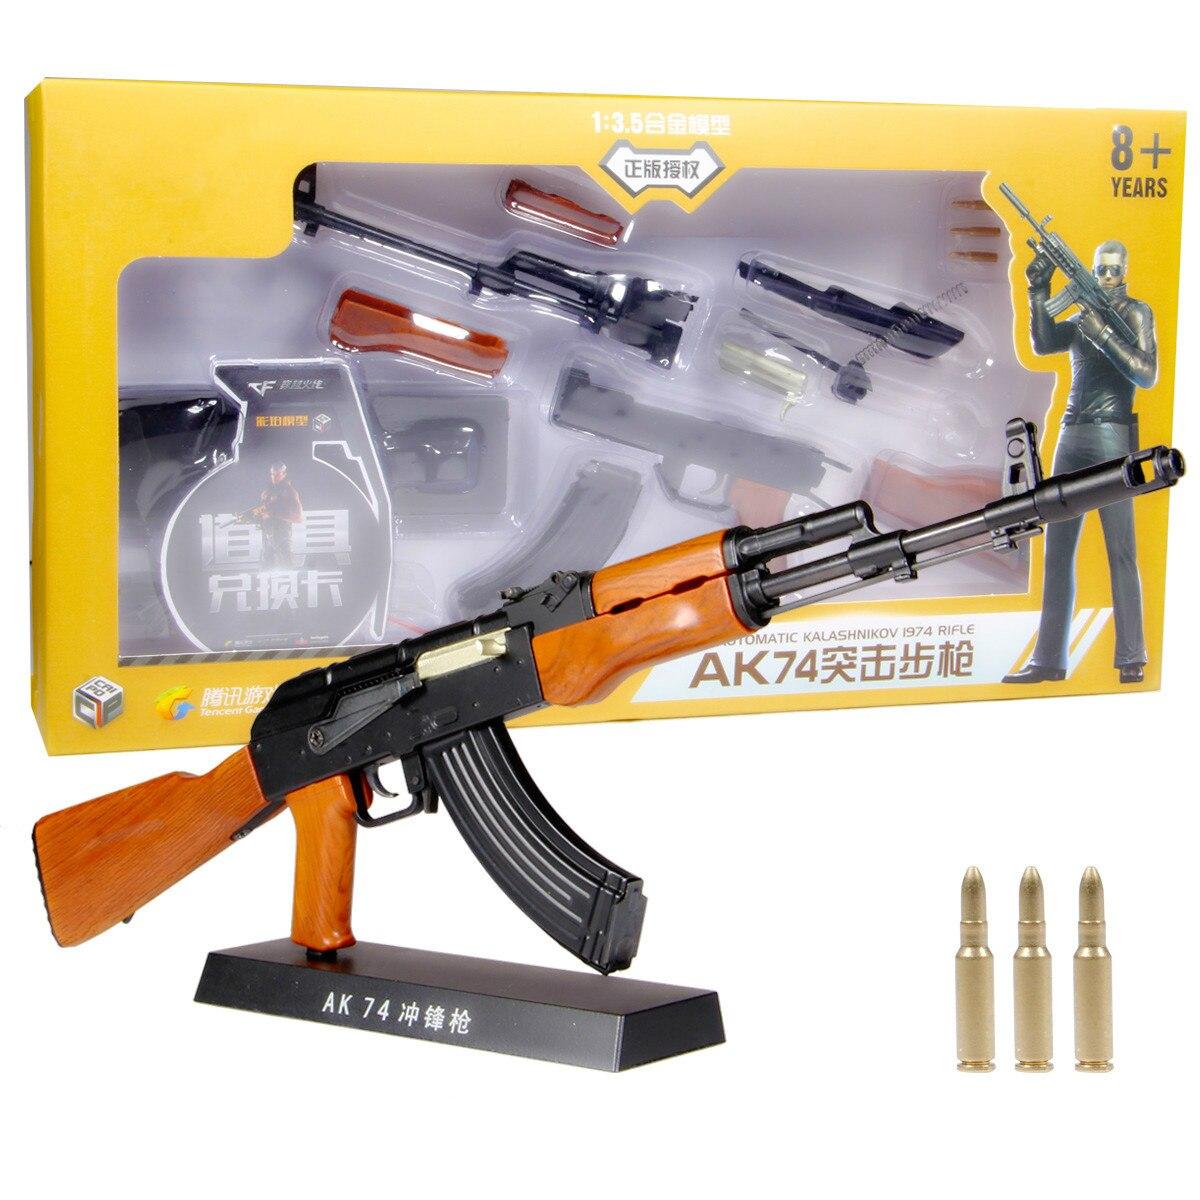 1 3 5 Metal Toy Gun AK47 gun model for children DIY gift model gun